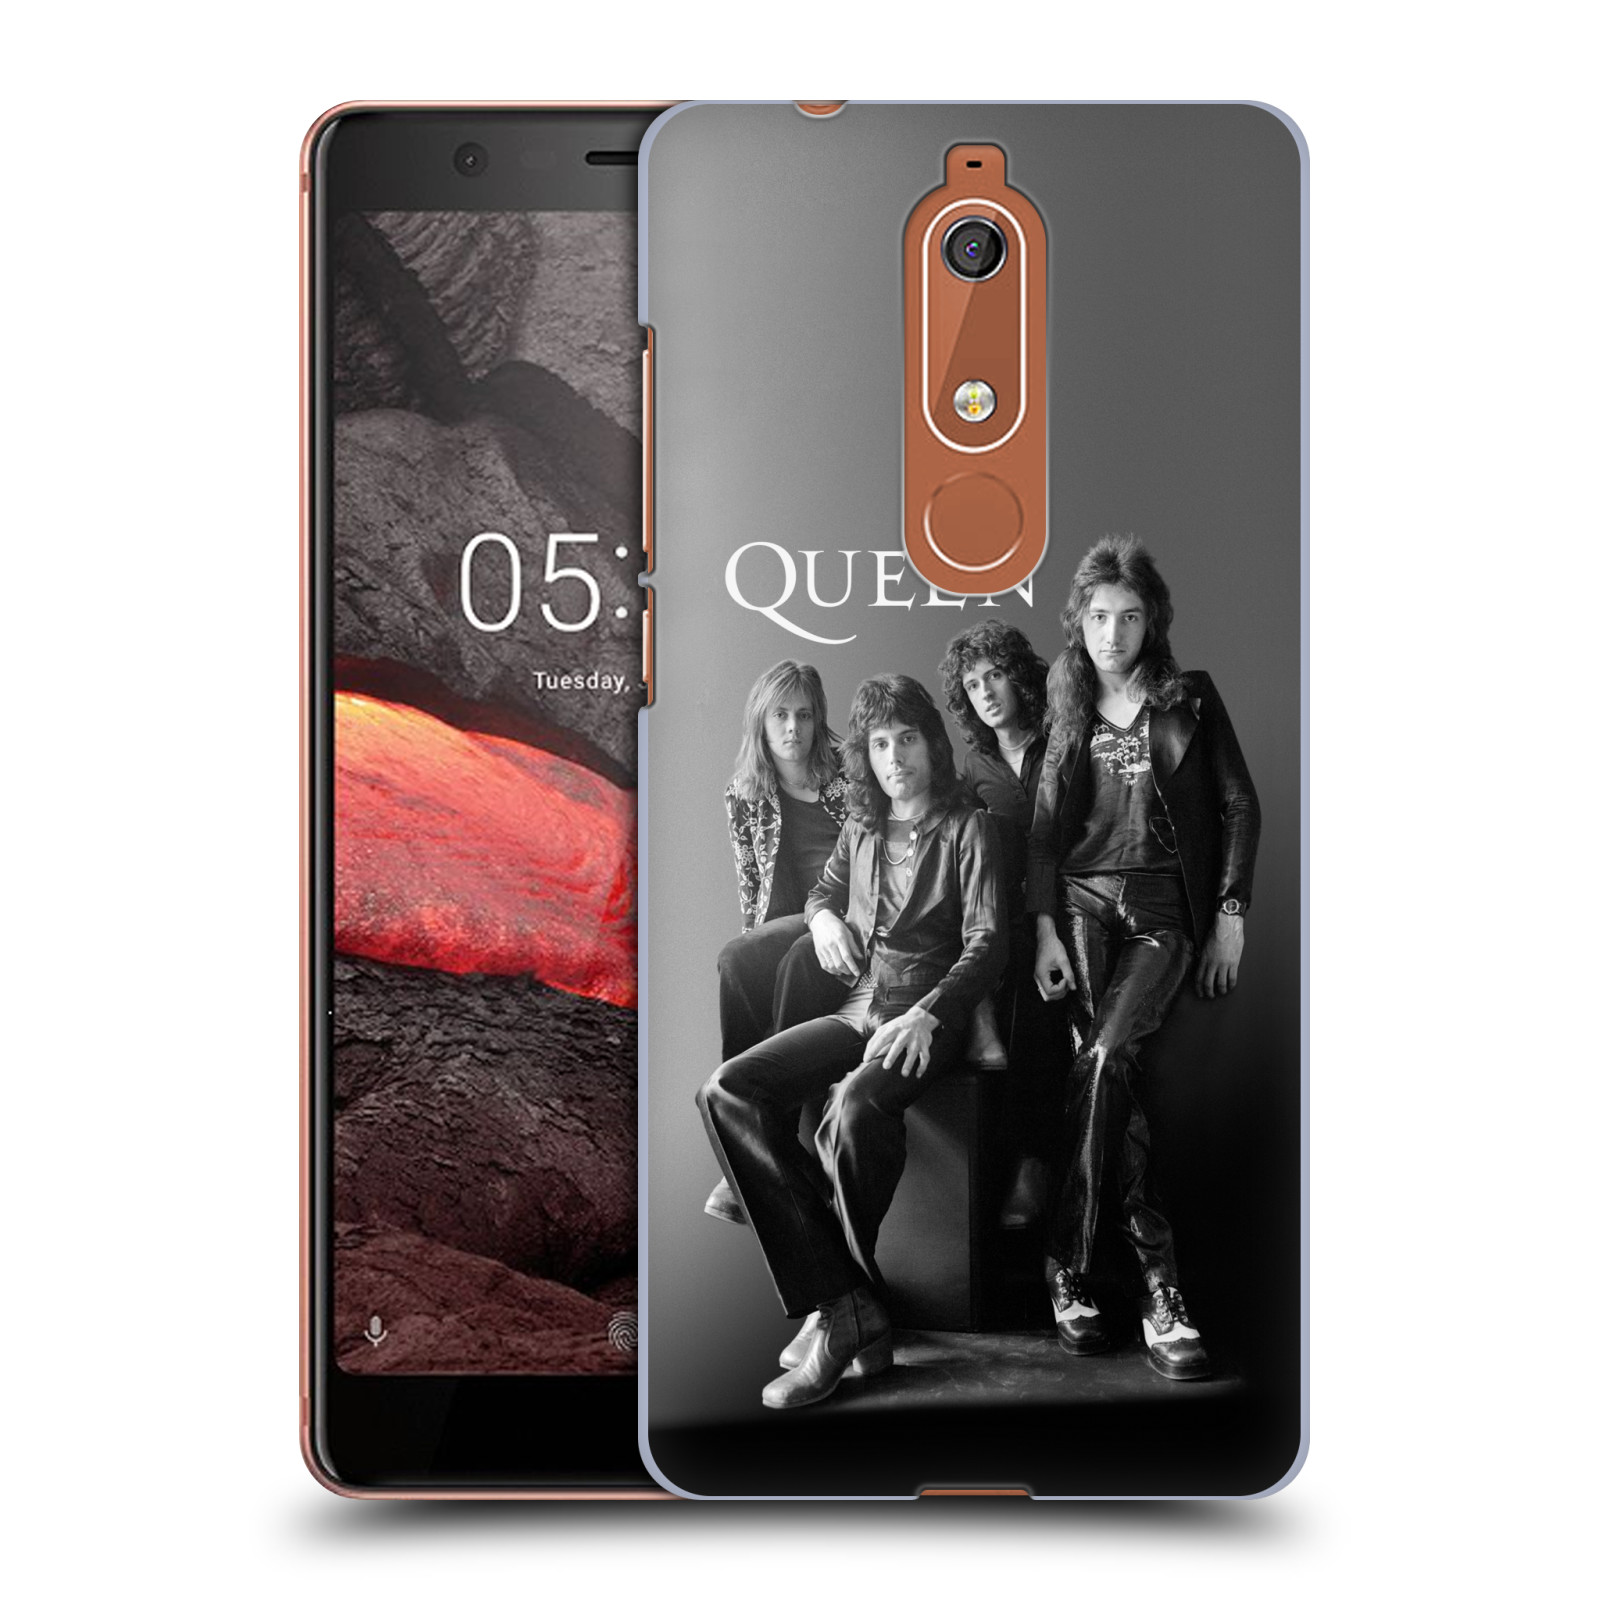 Plastové pouzdro na mobil Nokia 5.1 - Head Case - Queen - Skupina